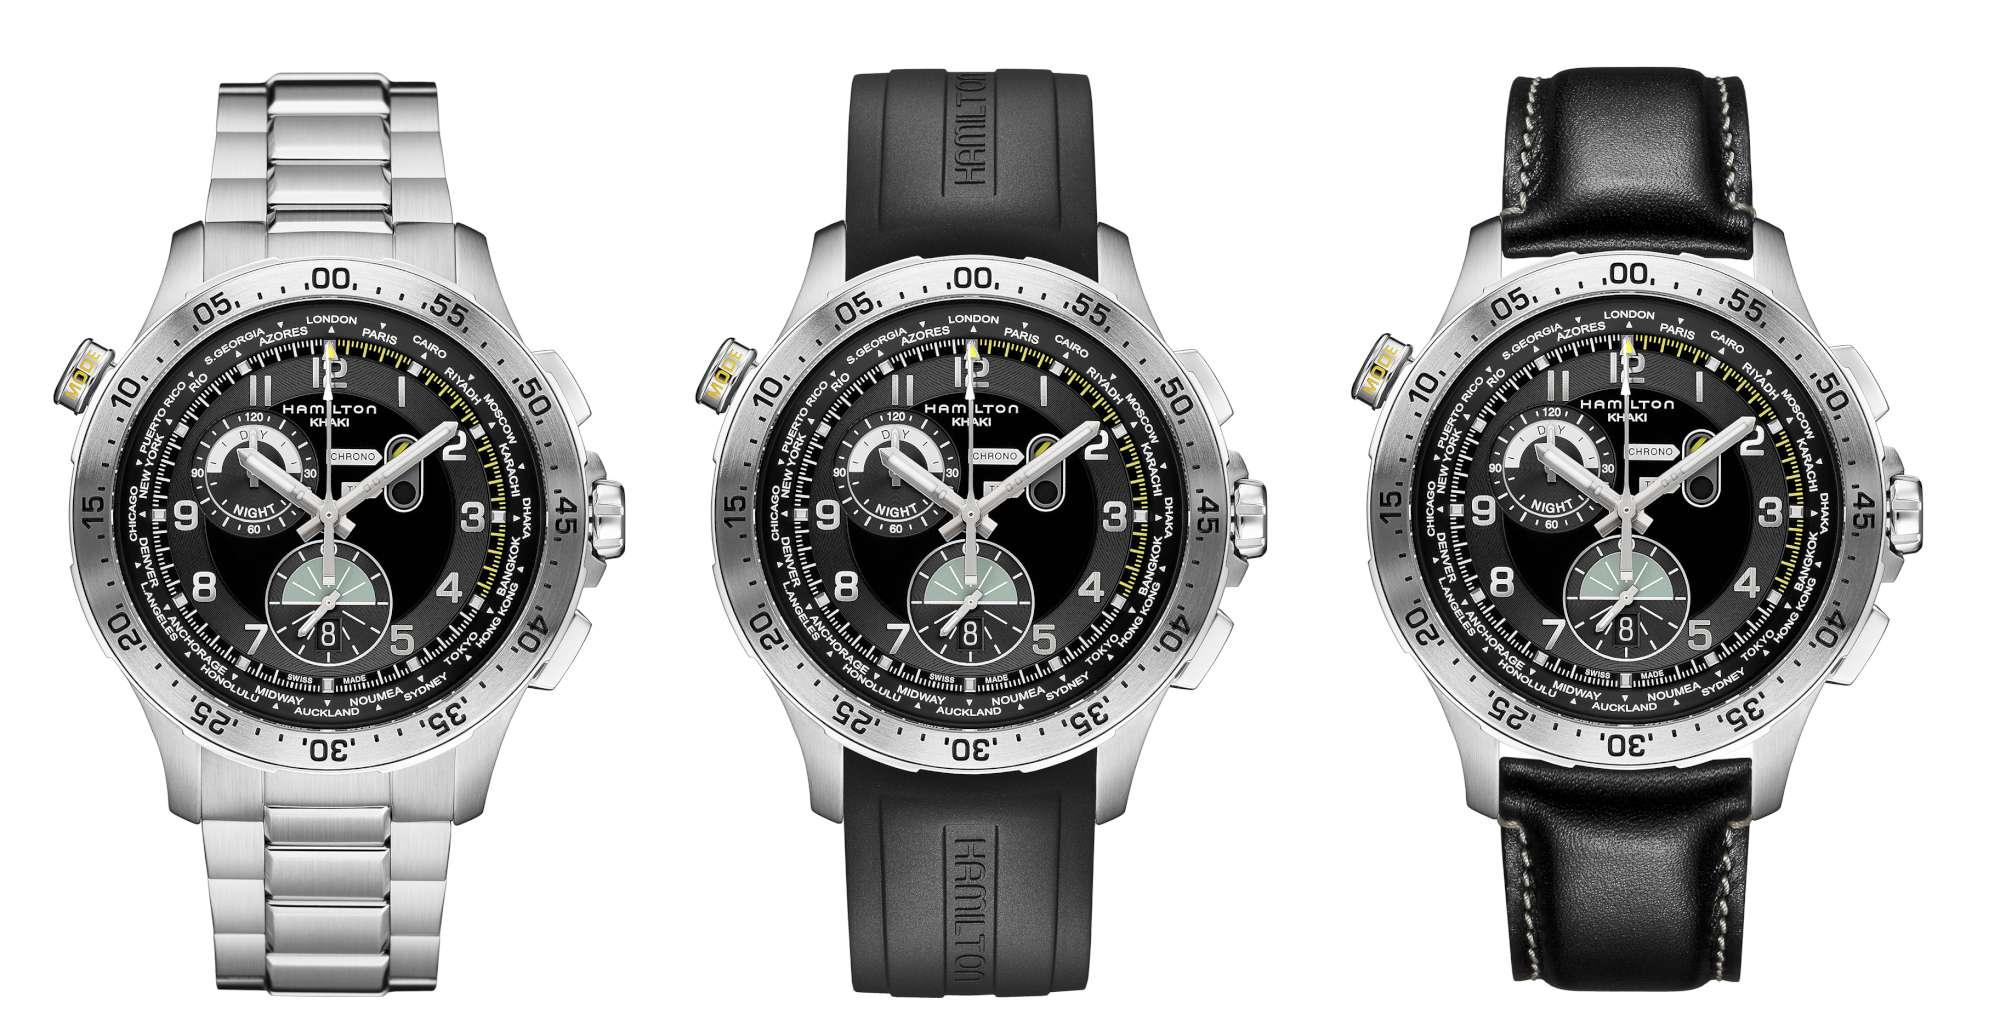 3_watches-2000